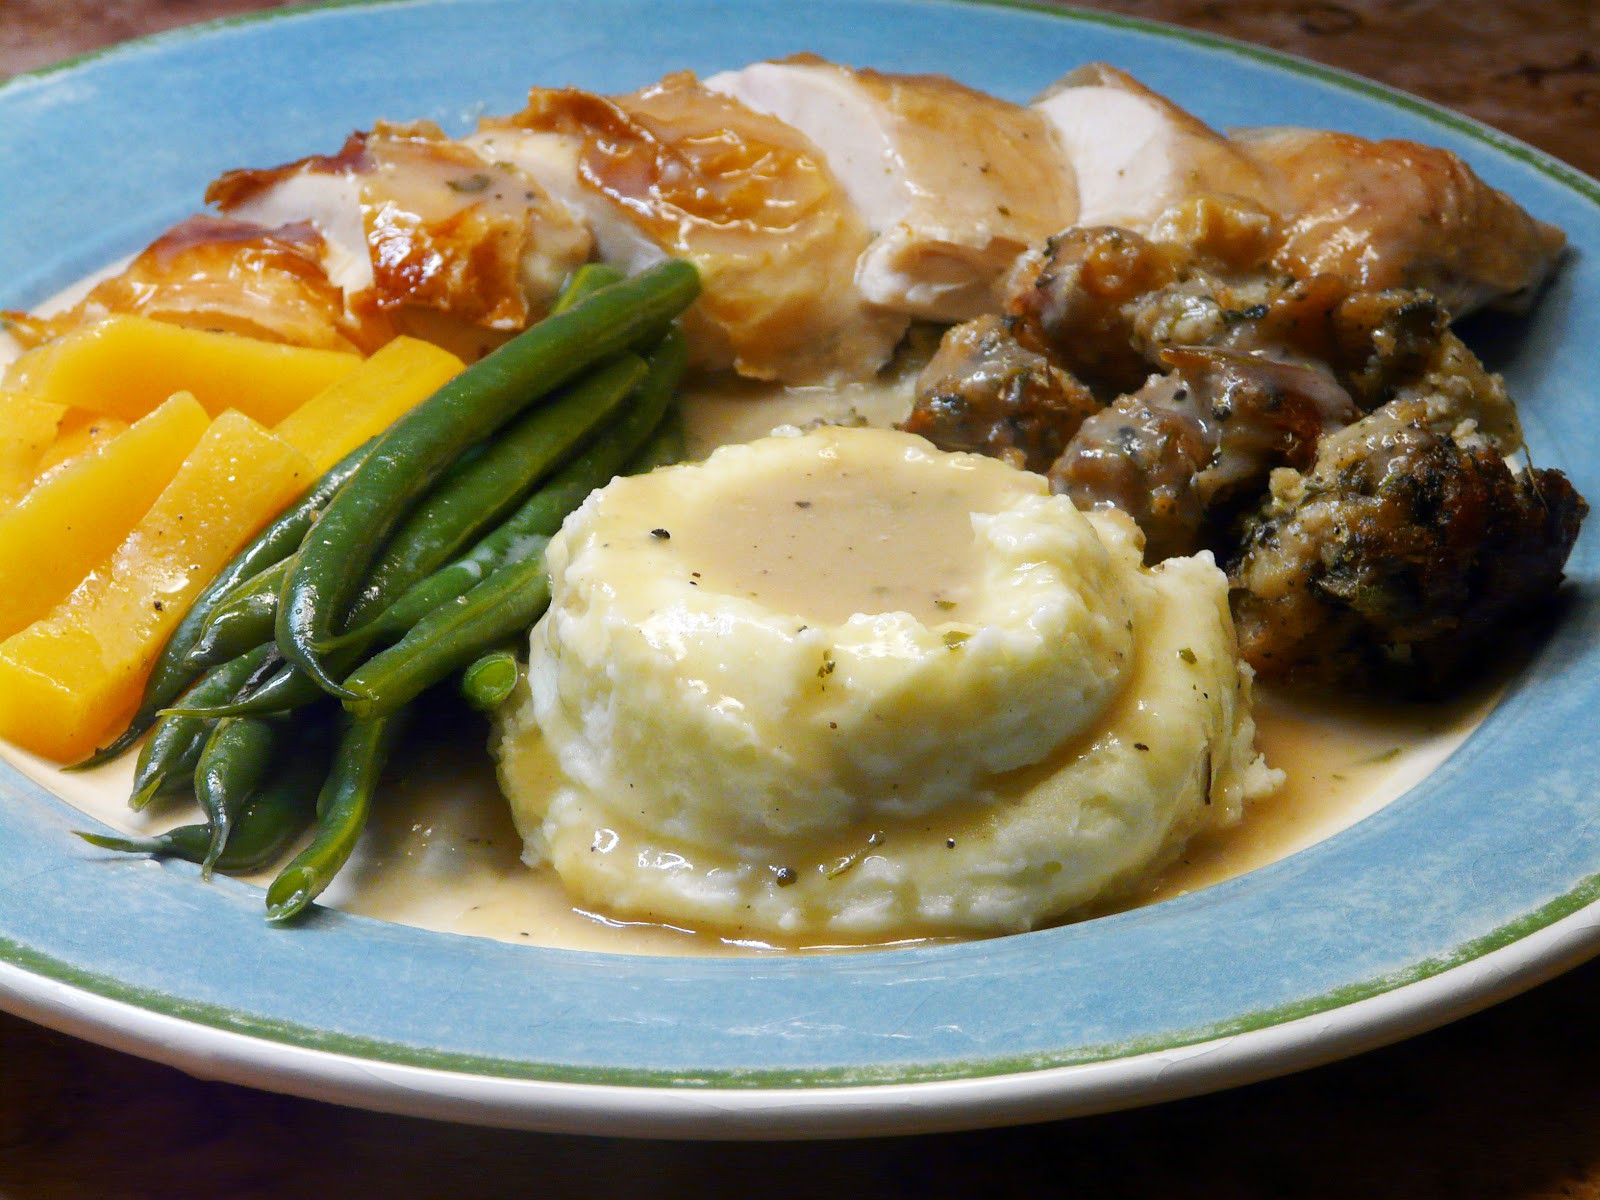 Roasted Chicken Dinners  Thibeault s Table Roast Chicken Dinner